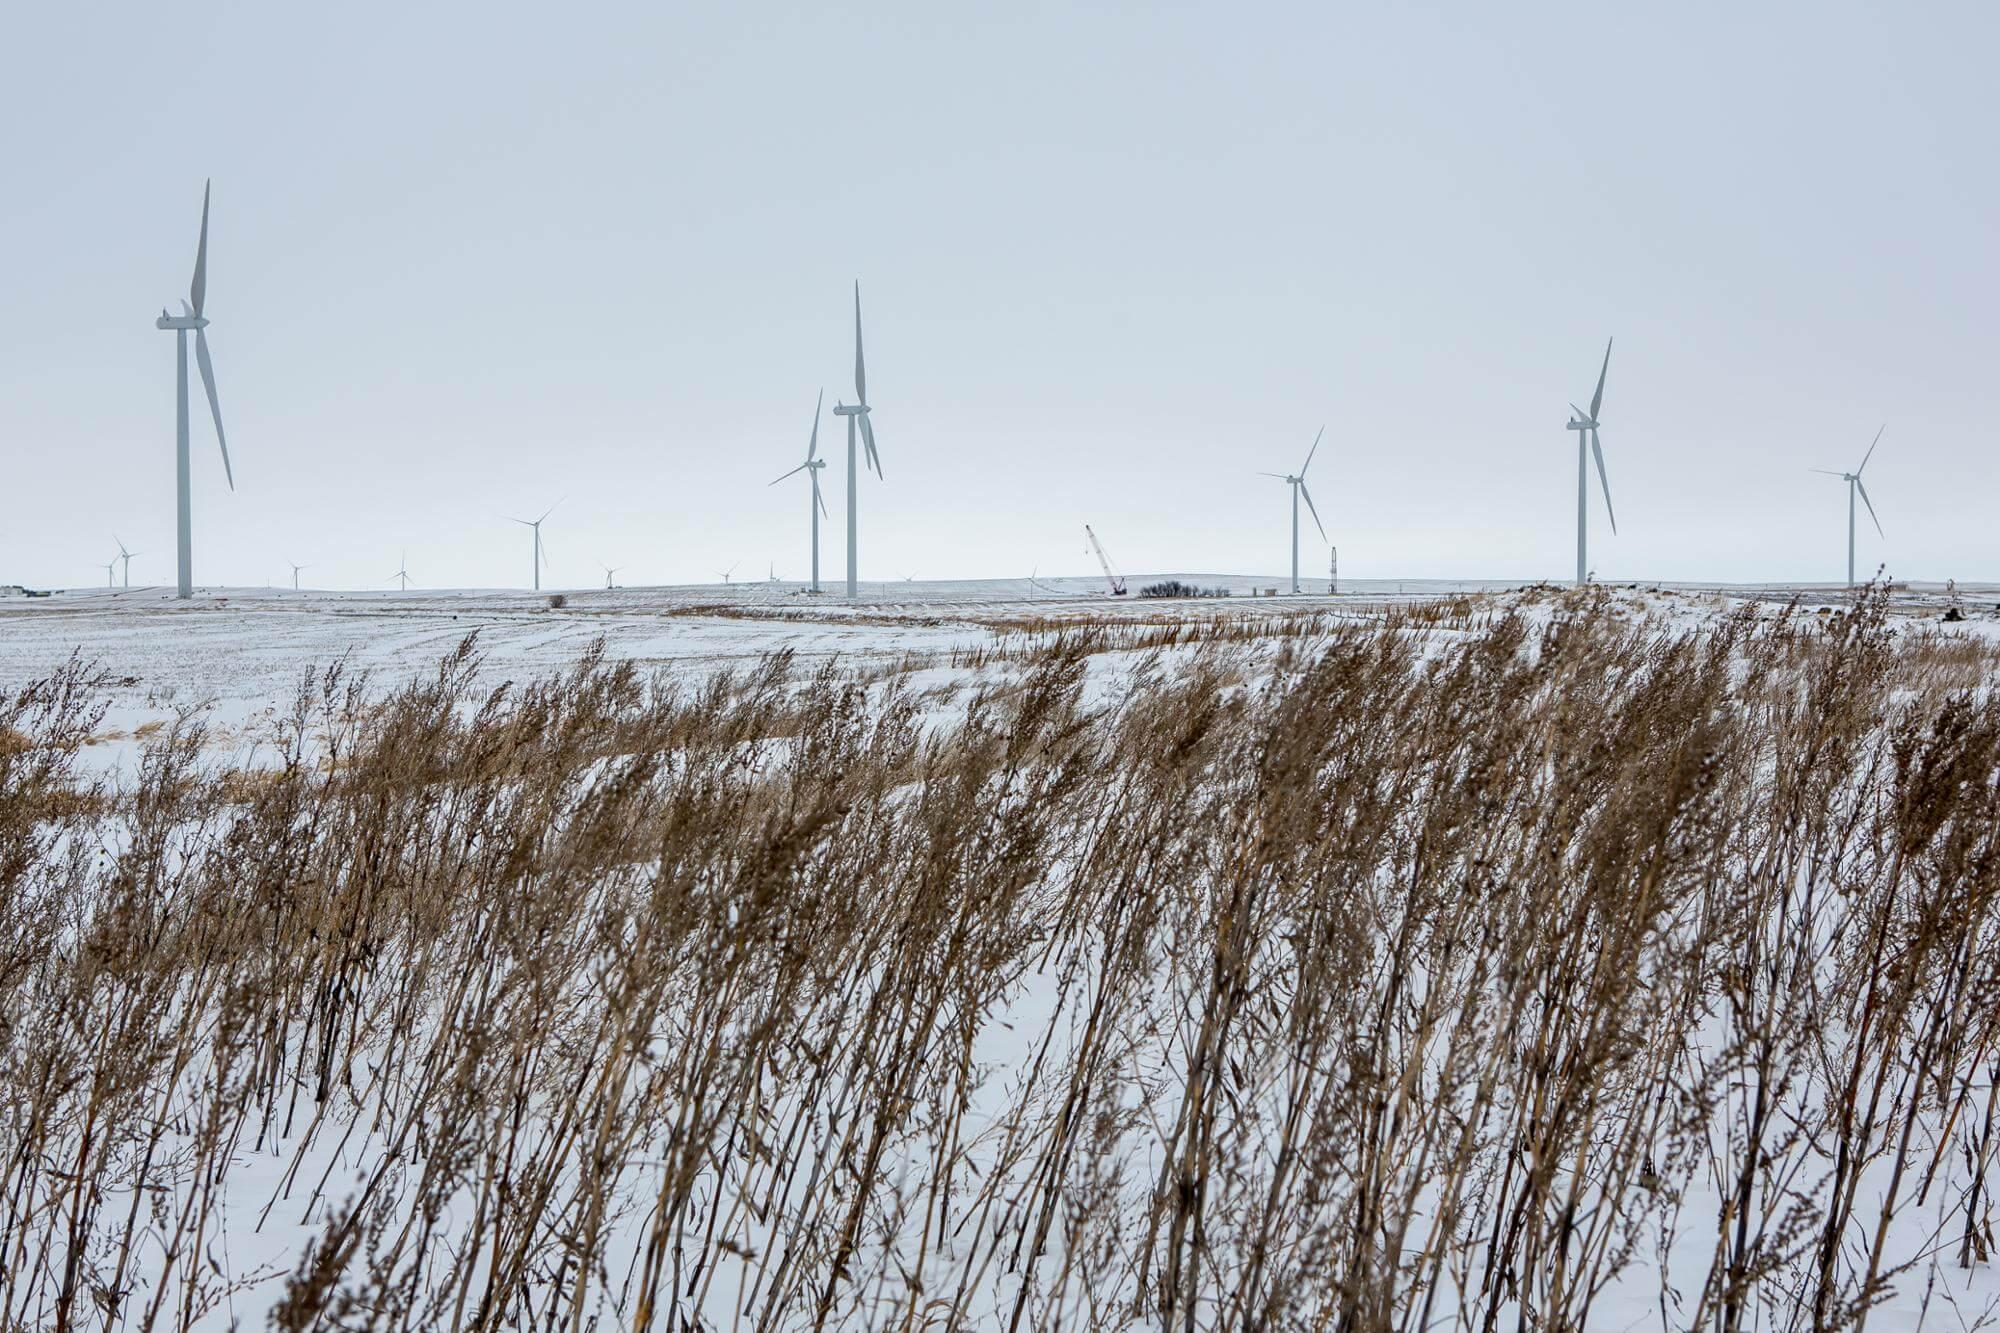 lindahl wind farm